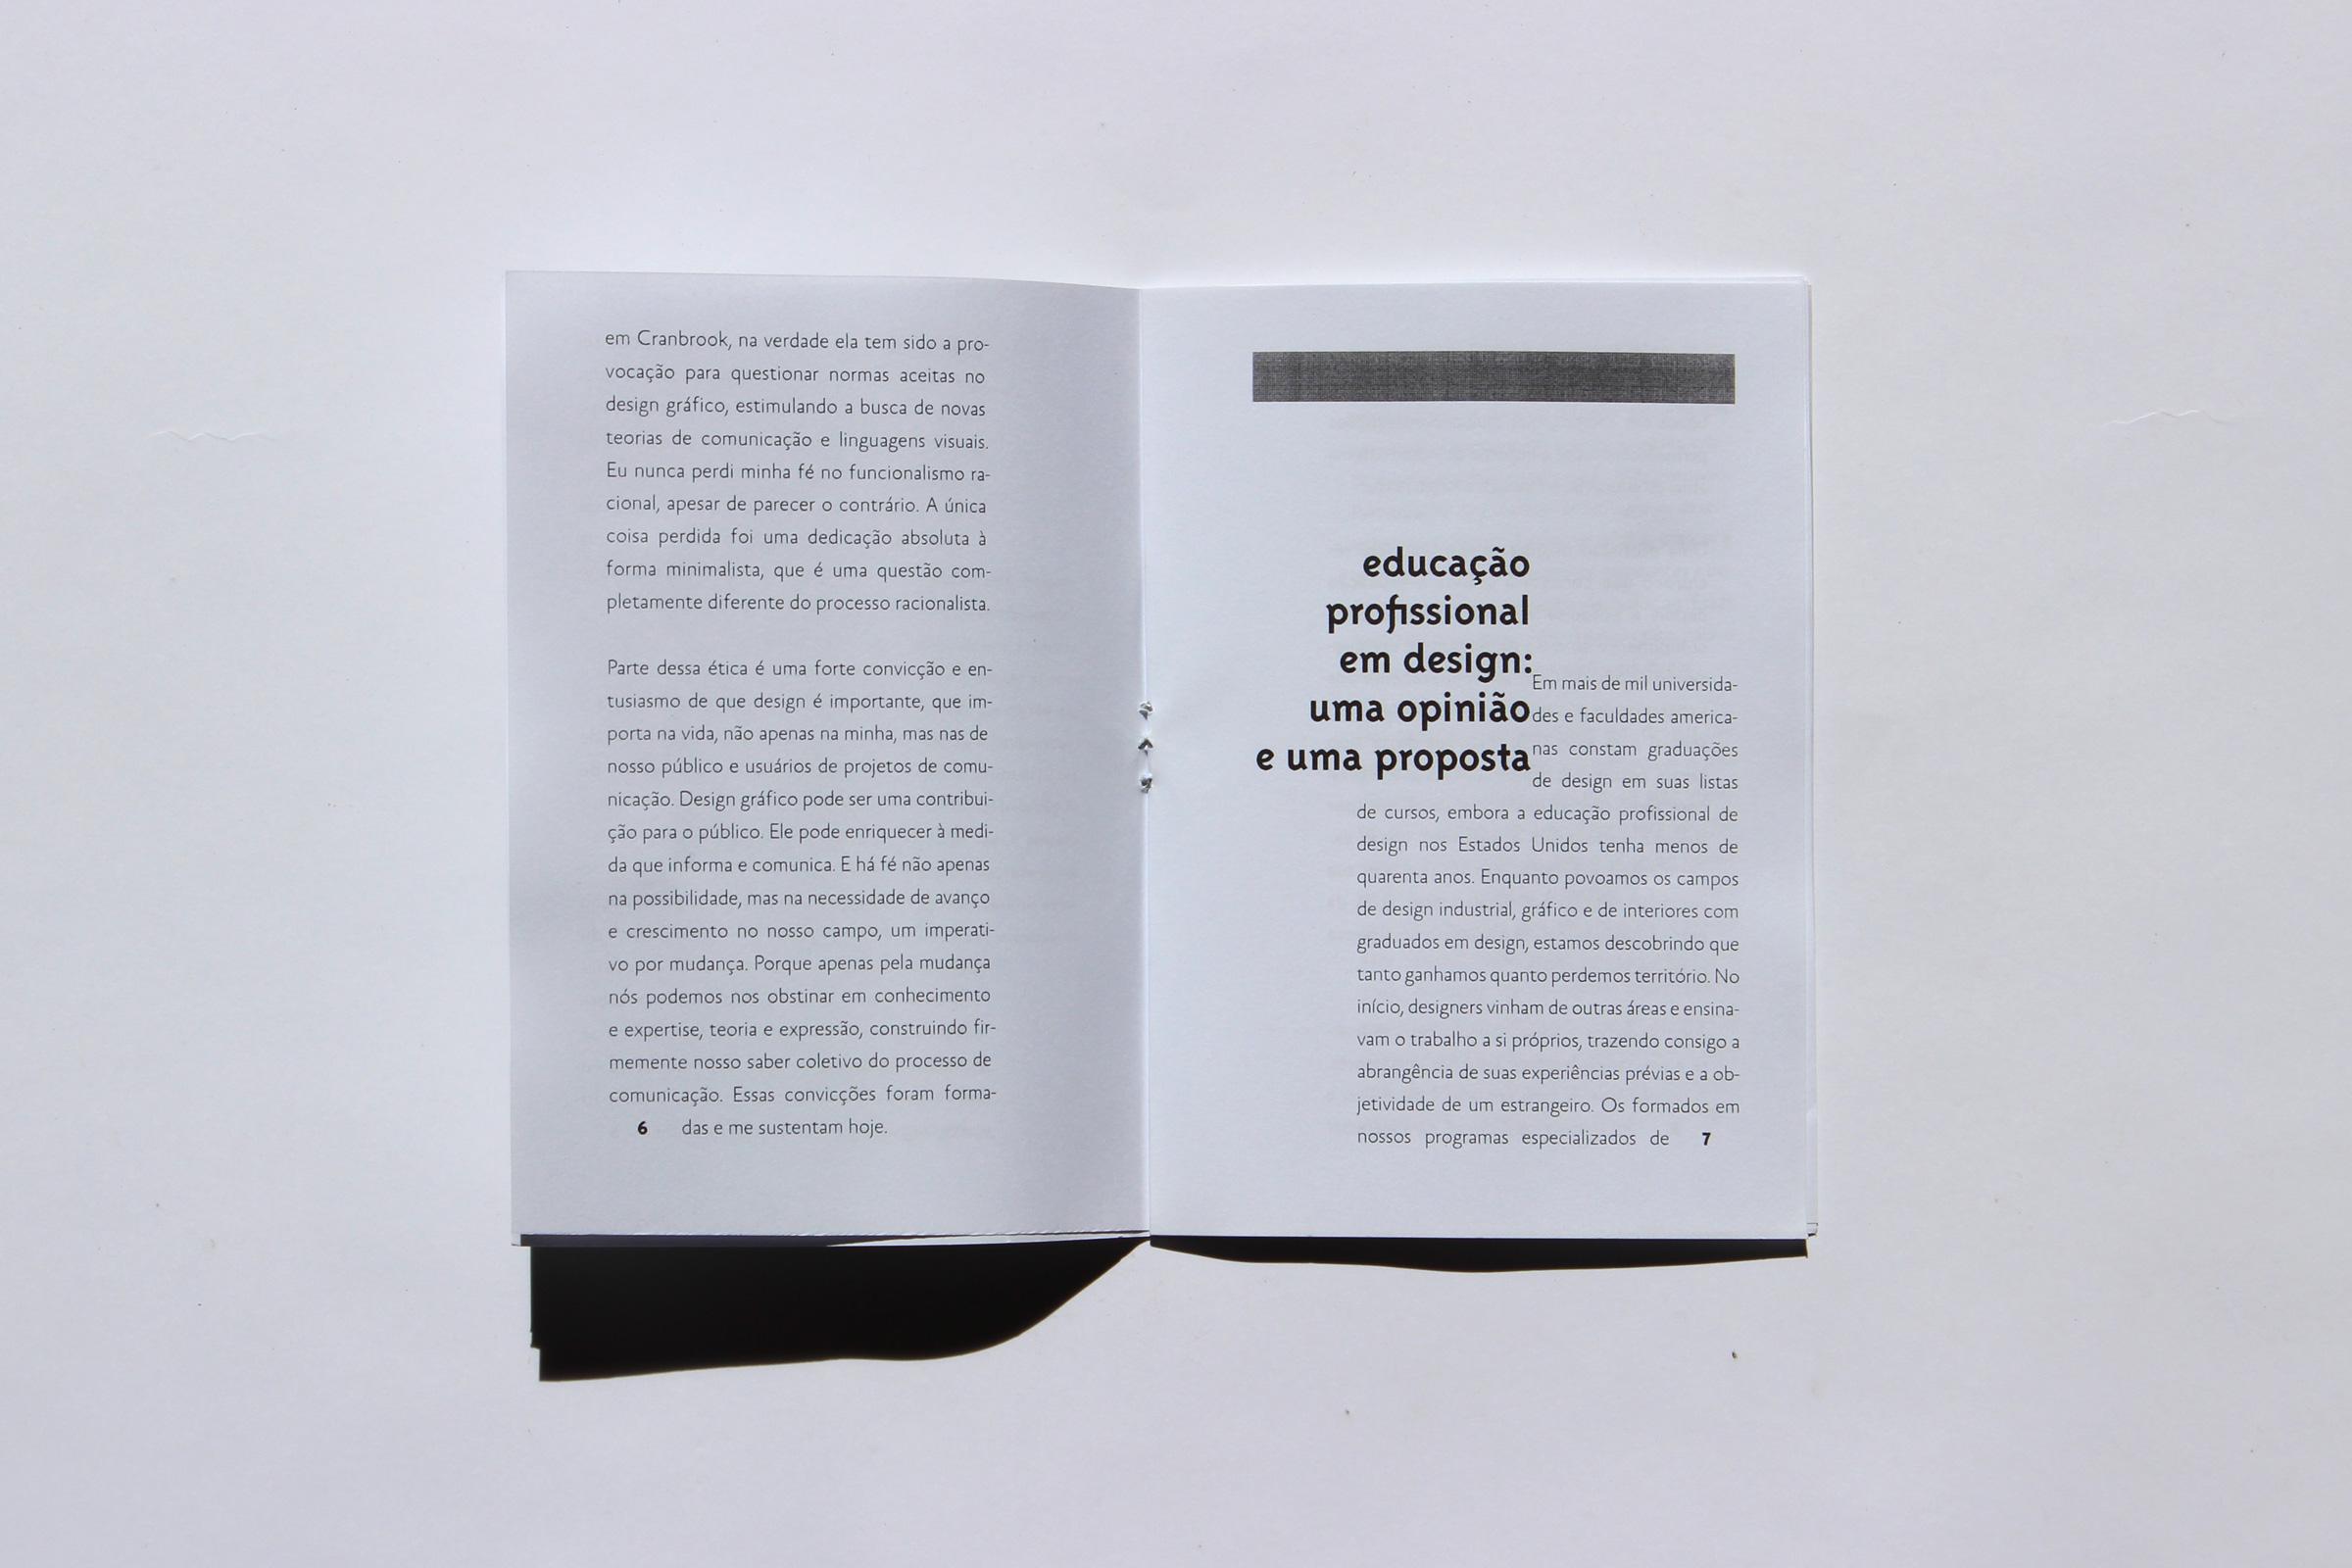 impresso03.jpg